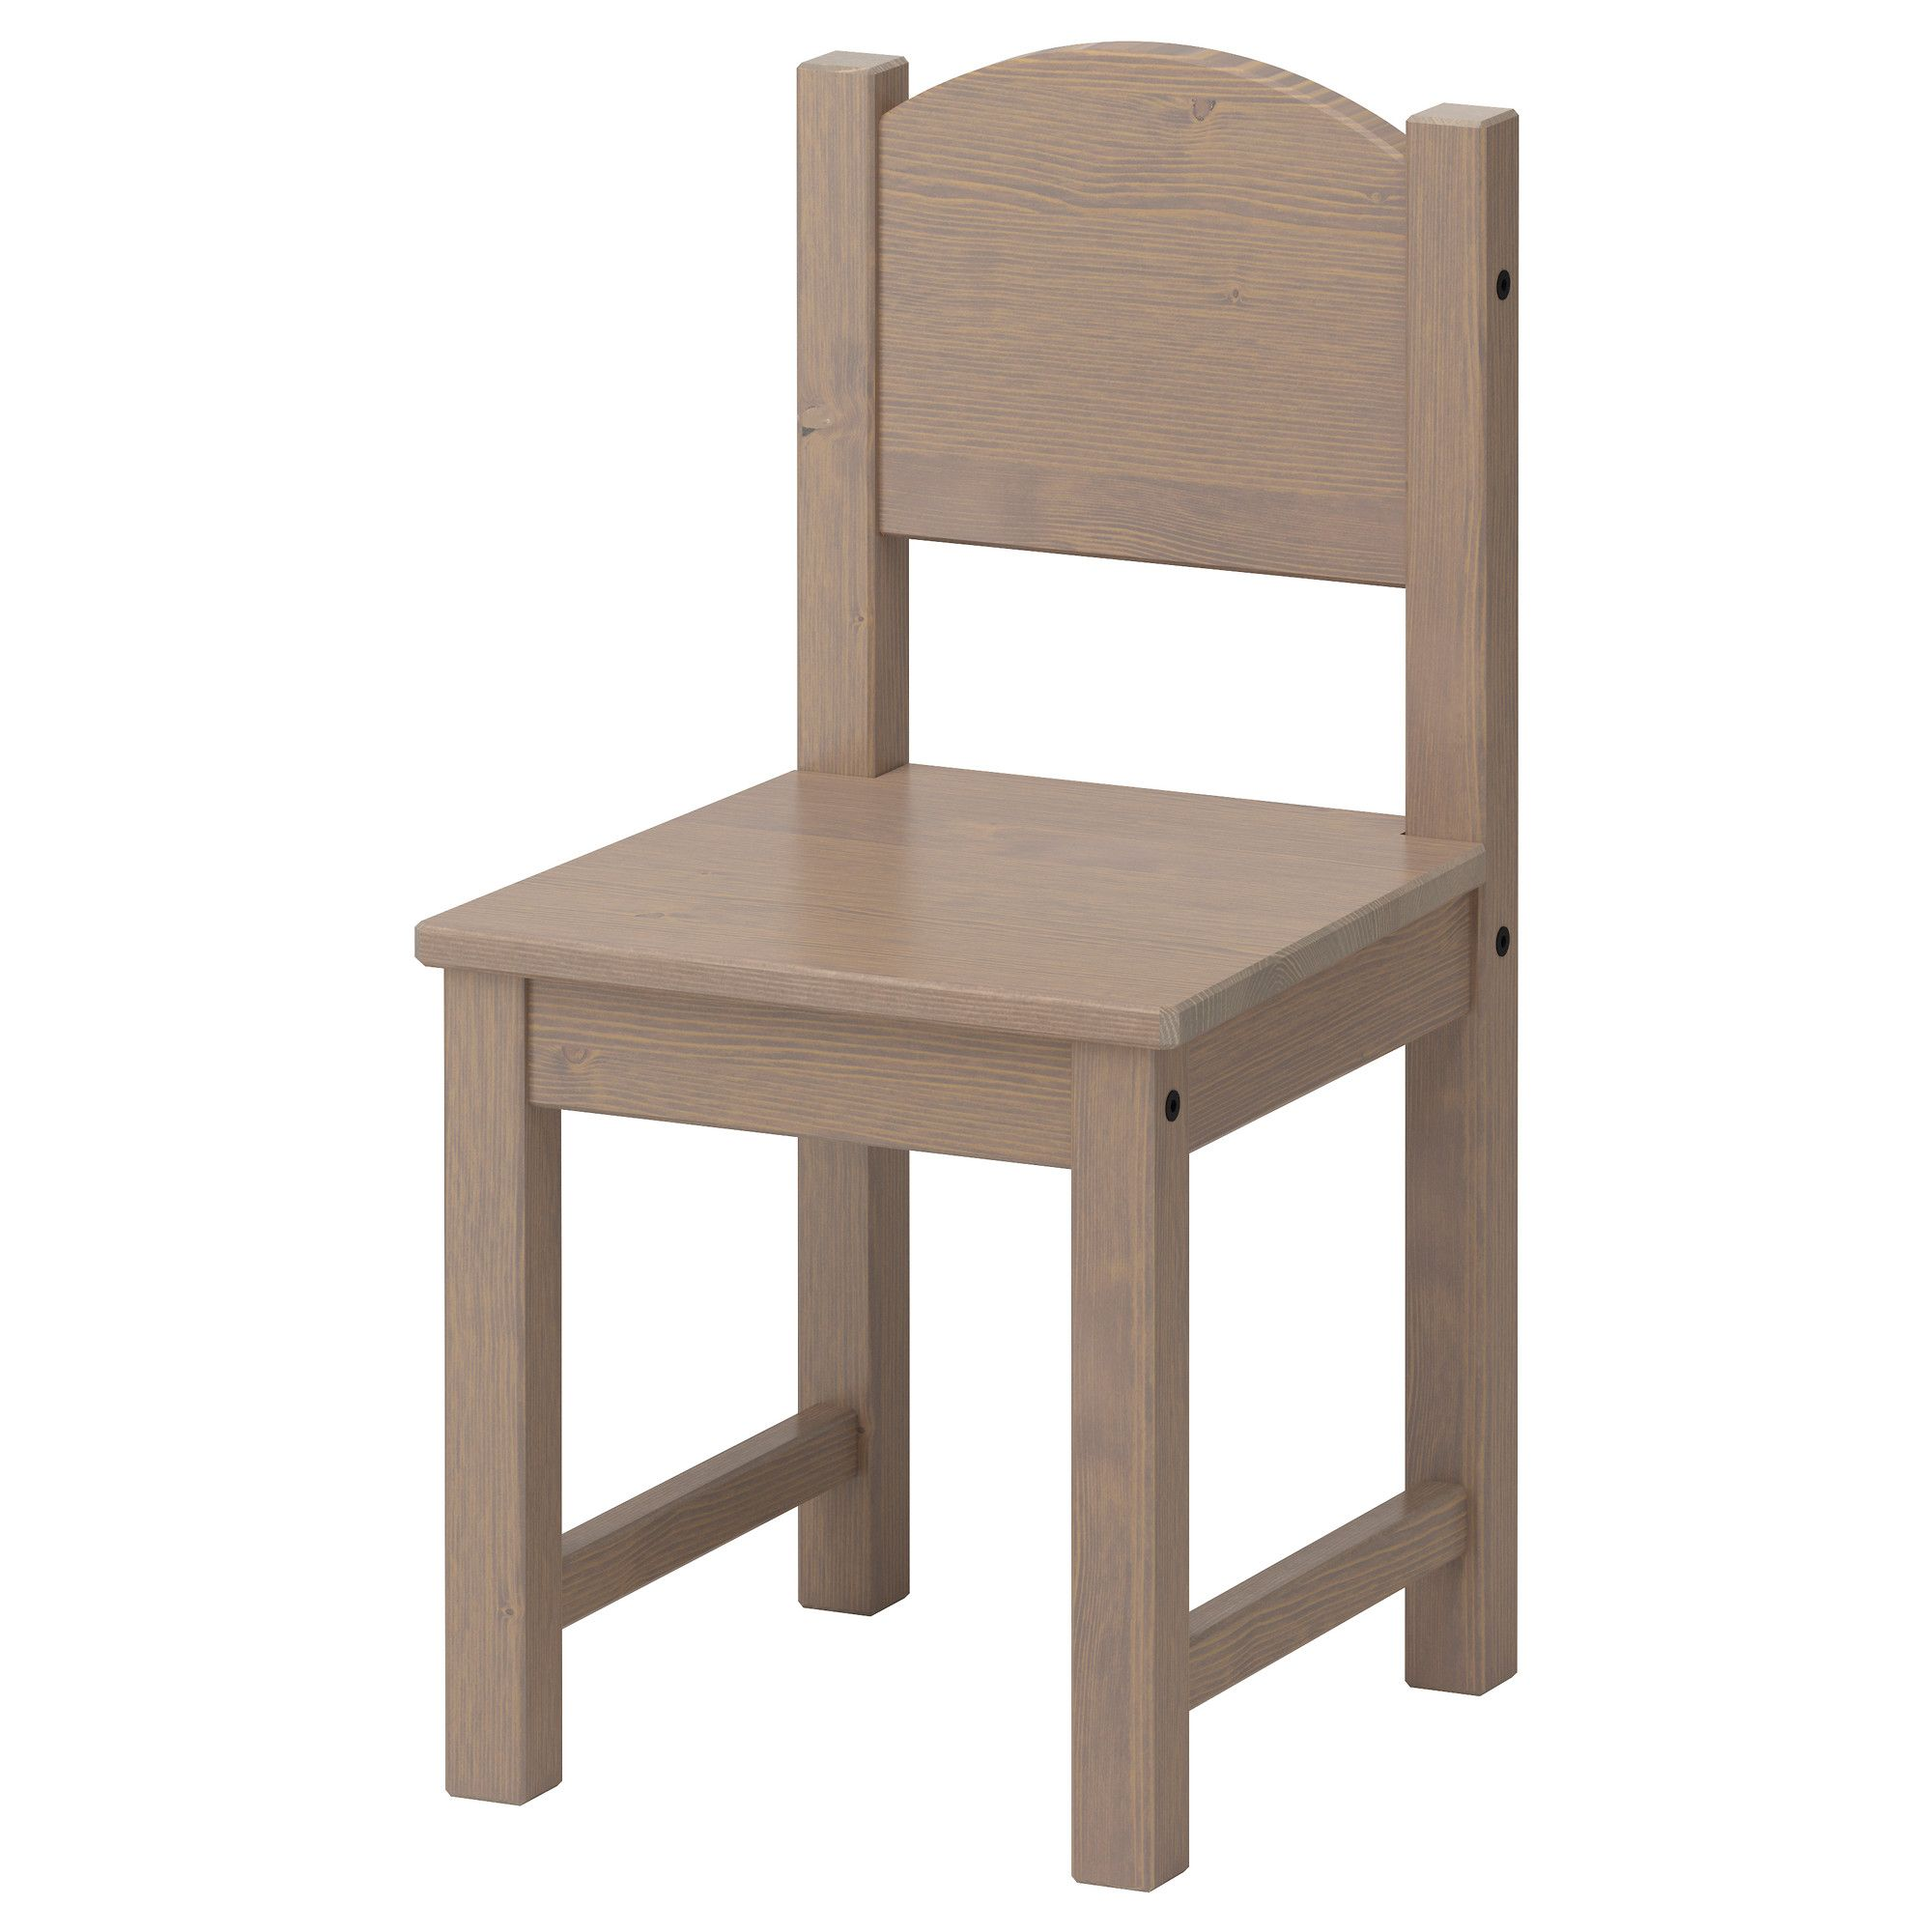 ikea playroom furniture. SUNDVIK Children\u0027s Chair - Gray-brown IKEA~Boy\u0027s Nursery $19.99 Each W11\ Ikea Playroom Furniture C